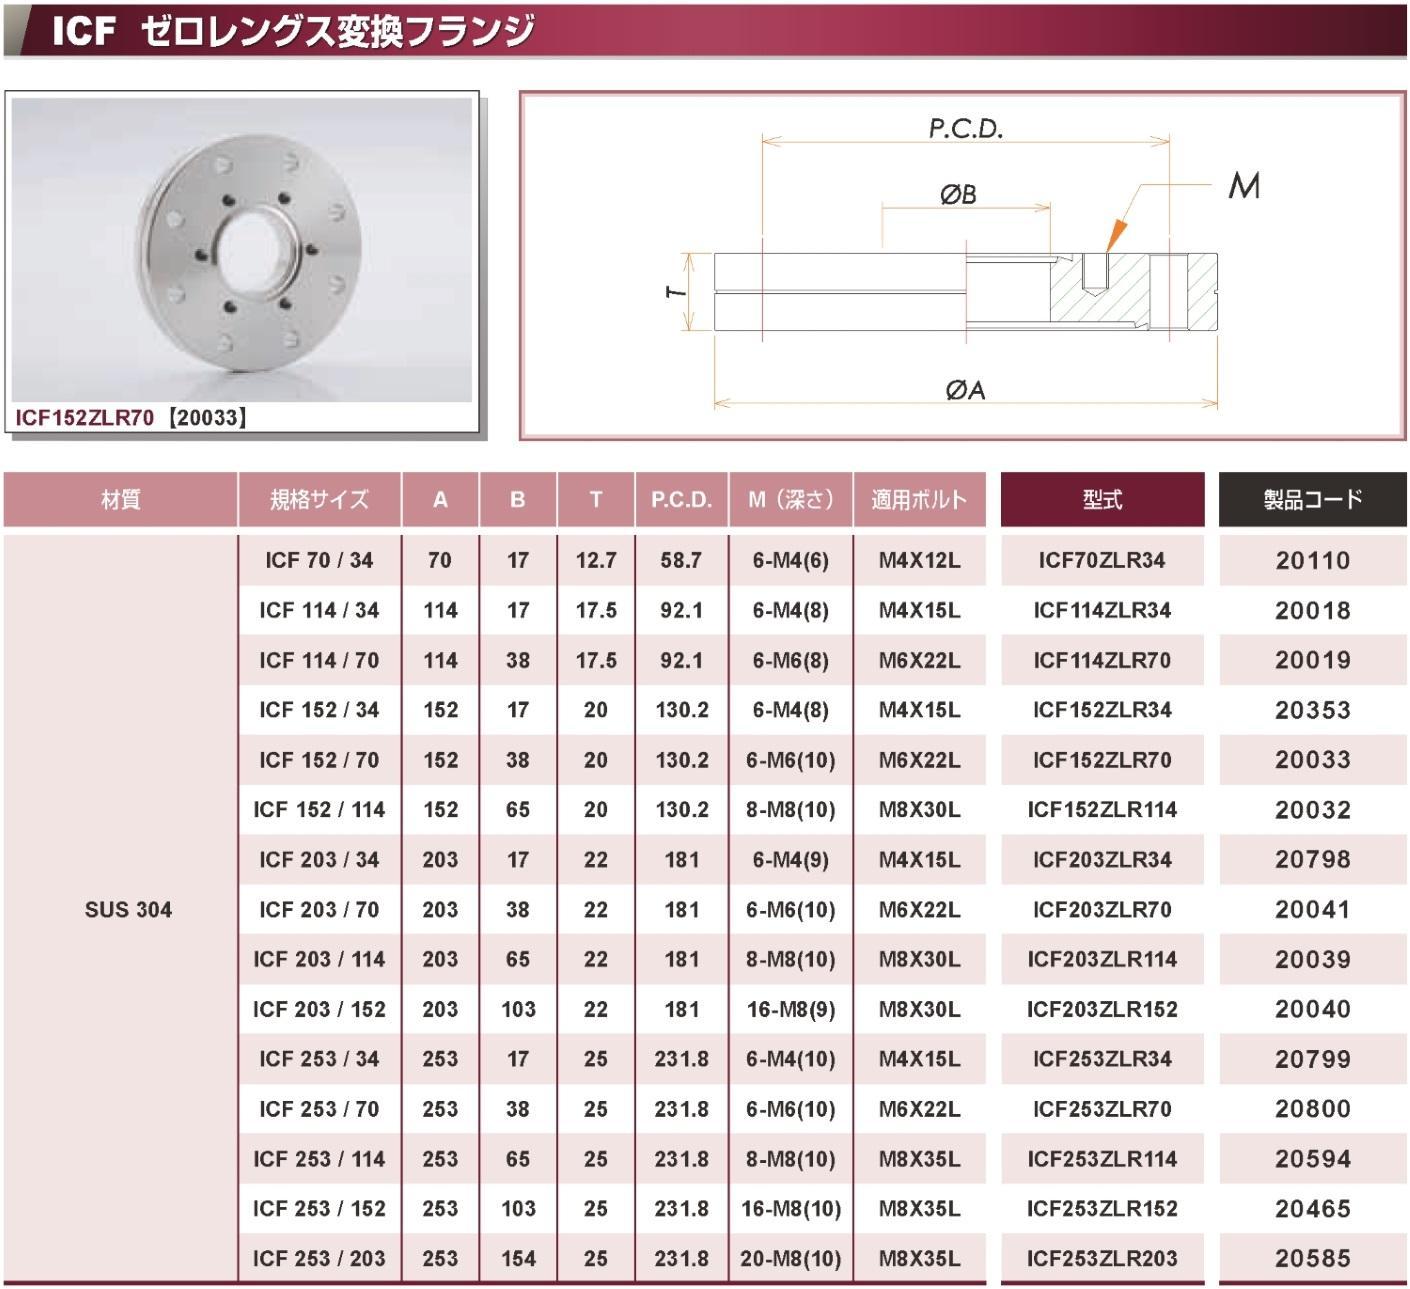 ICF253/114 ゼロレングス変換フランジ カタログ画像